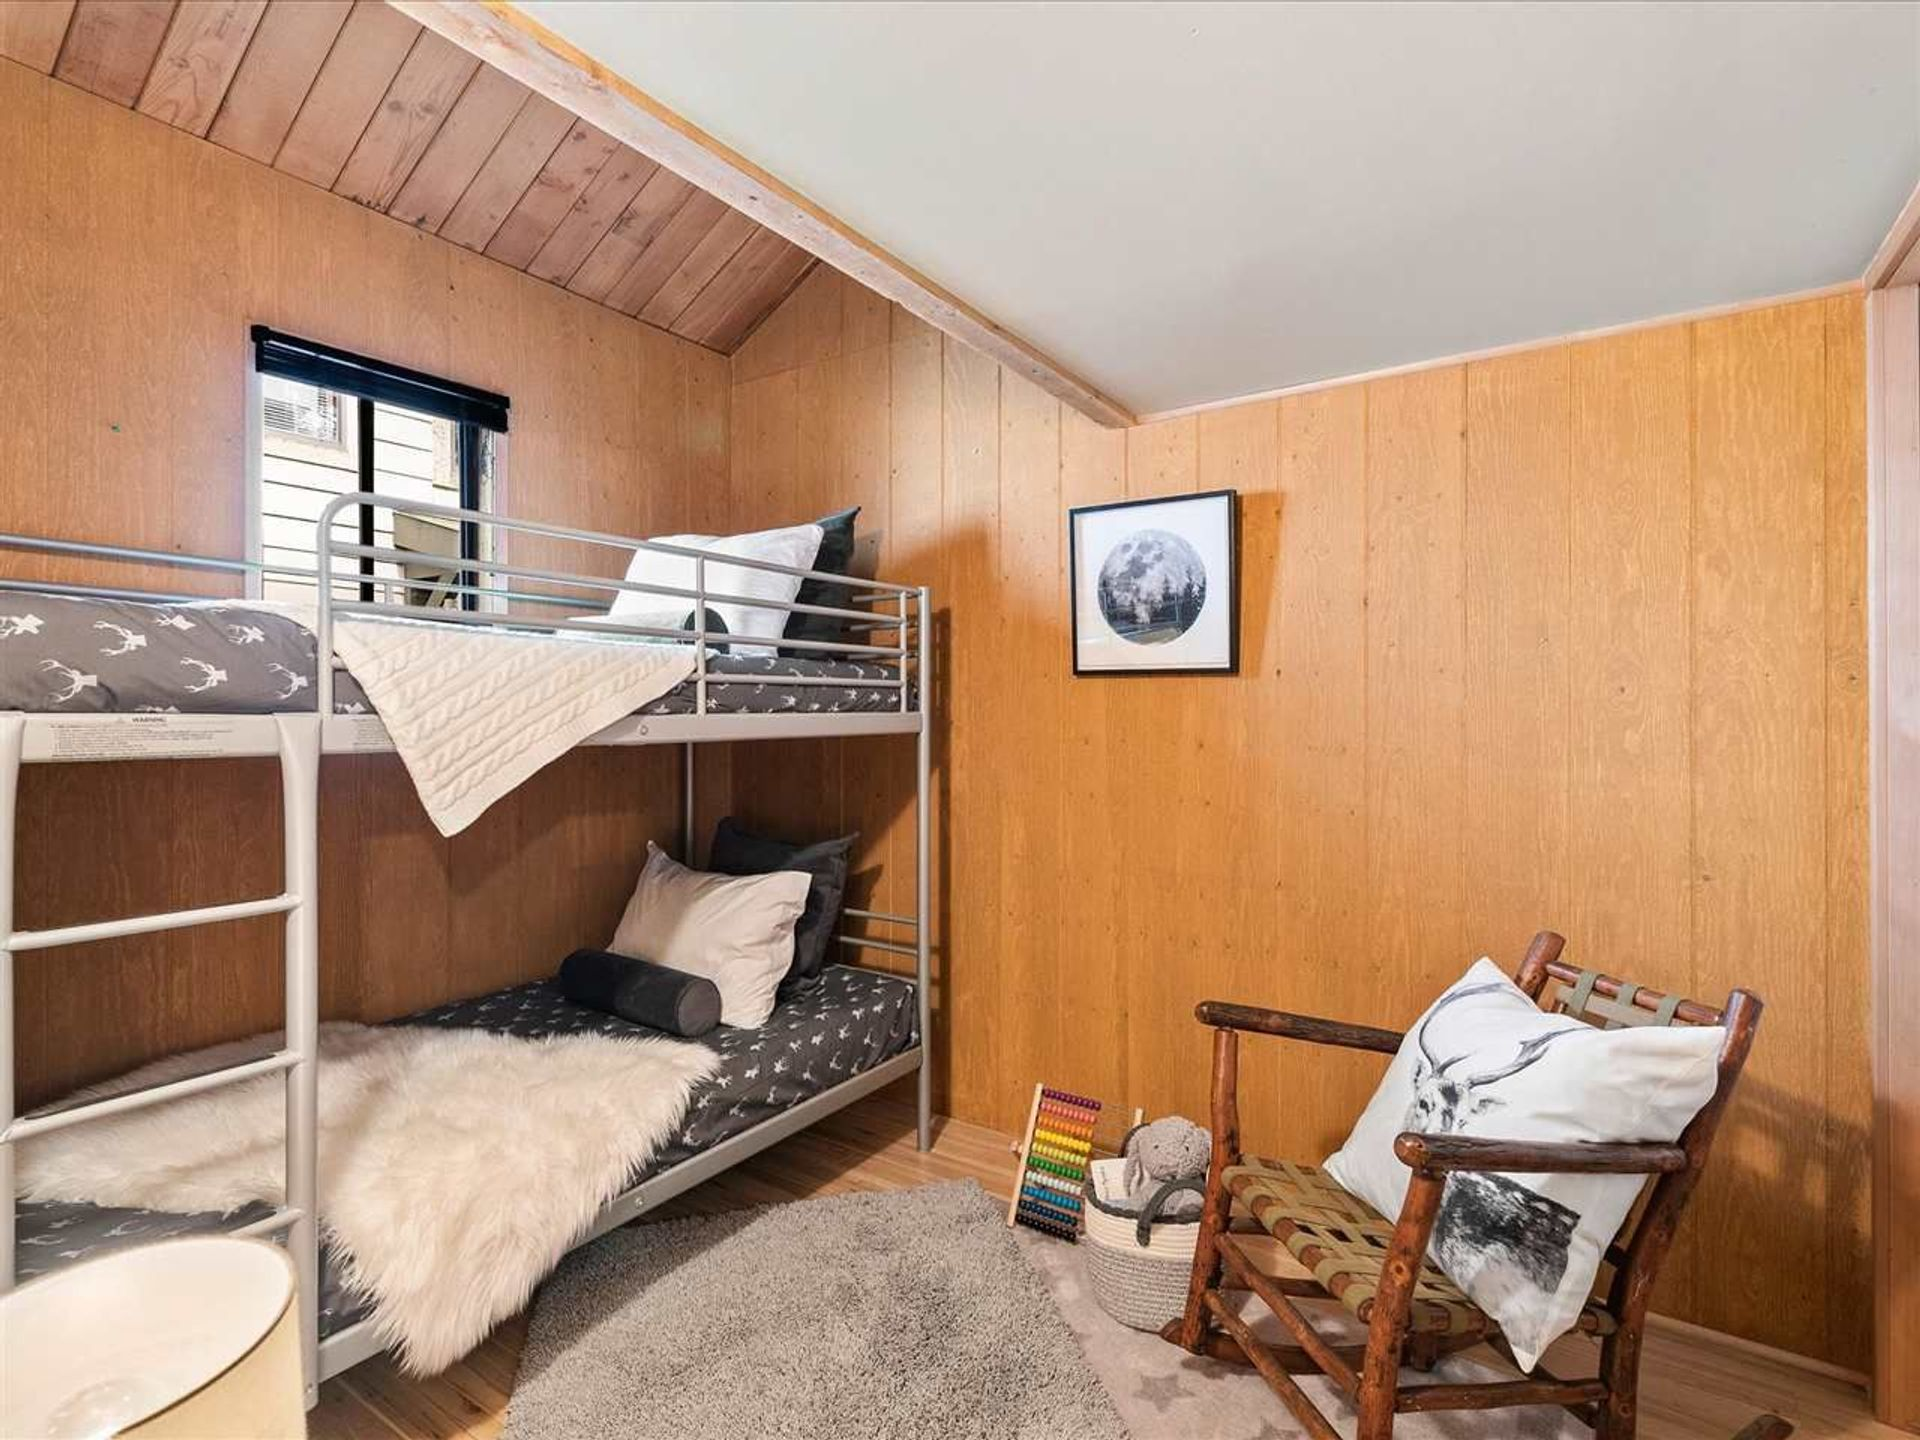 6900-crabapple-drive-whistler-cay-estates-whistler-18 at D8 - 6900 Crabapple Drive, Whistler Cay Estates, Whistler